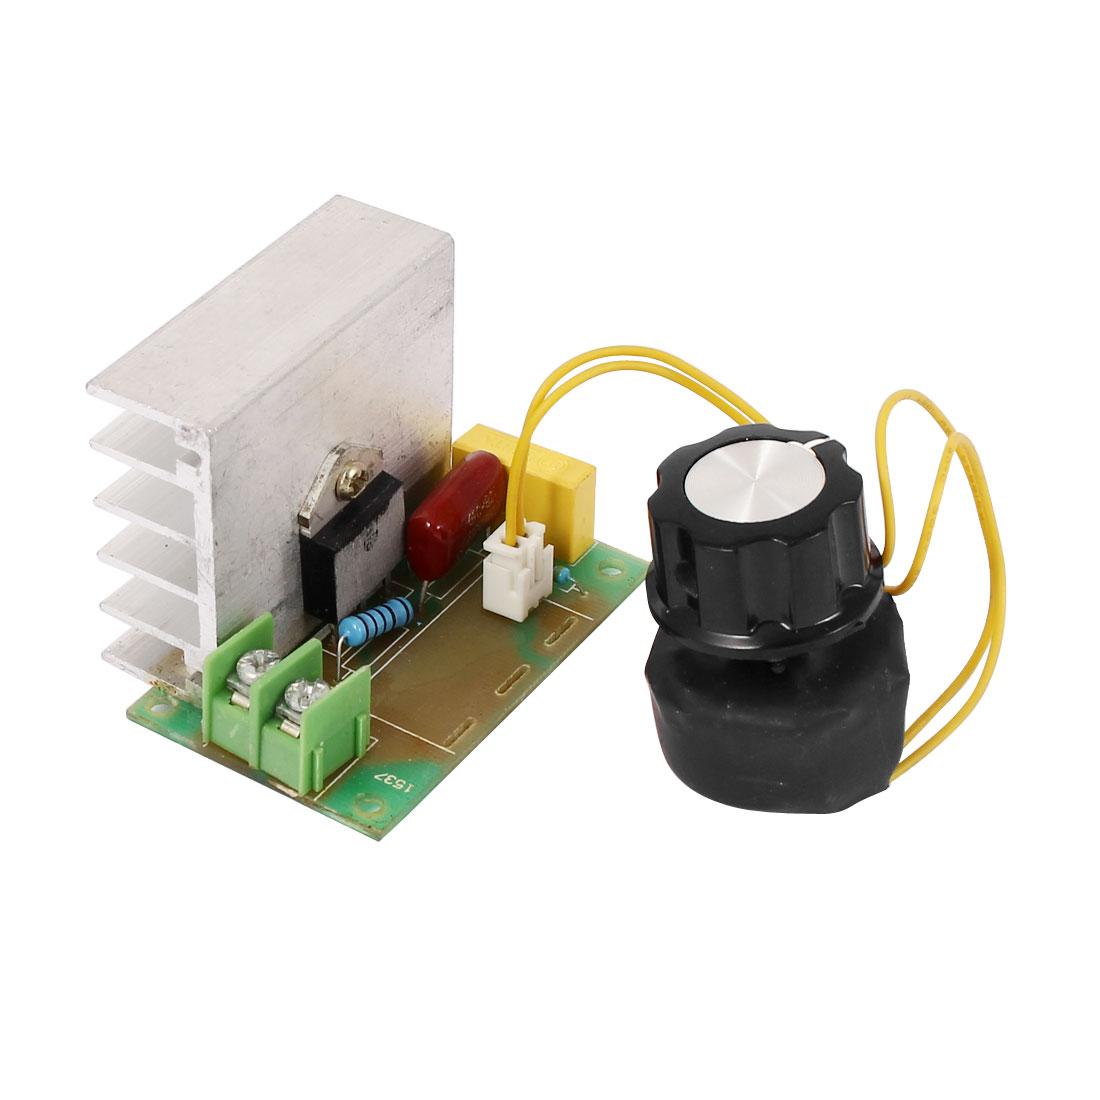 4000W AC 220V SCR Voltage Regulator Dimming Light Speed Controller Thermostat